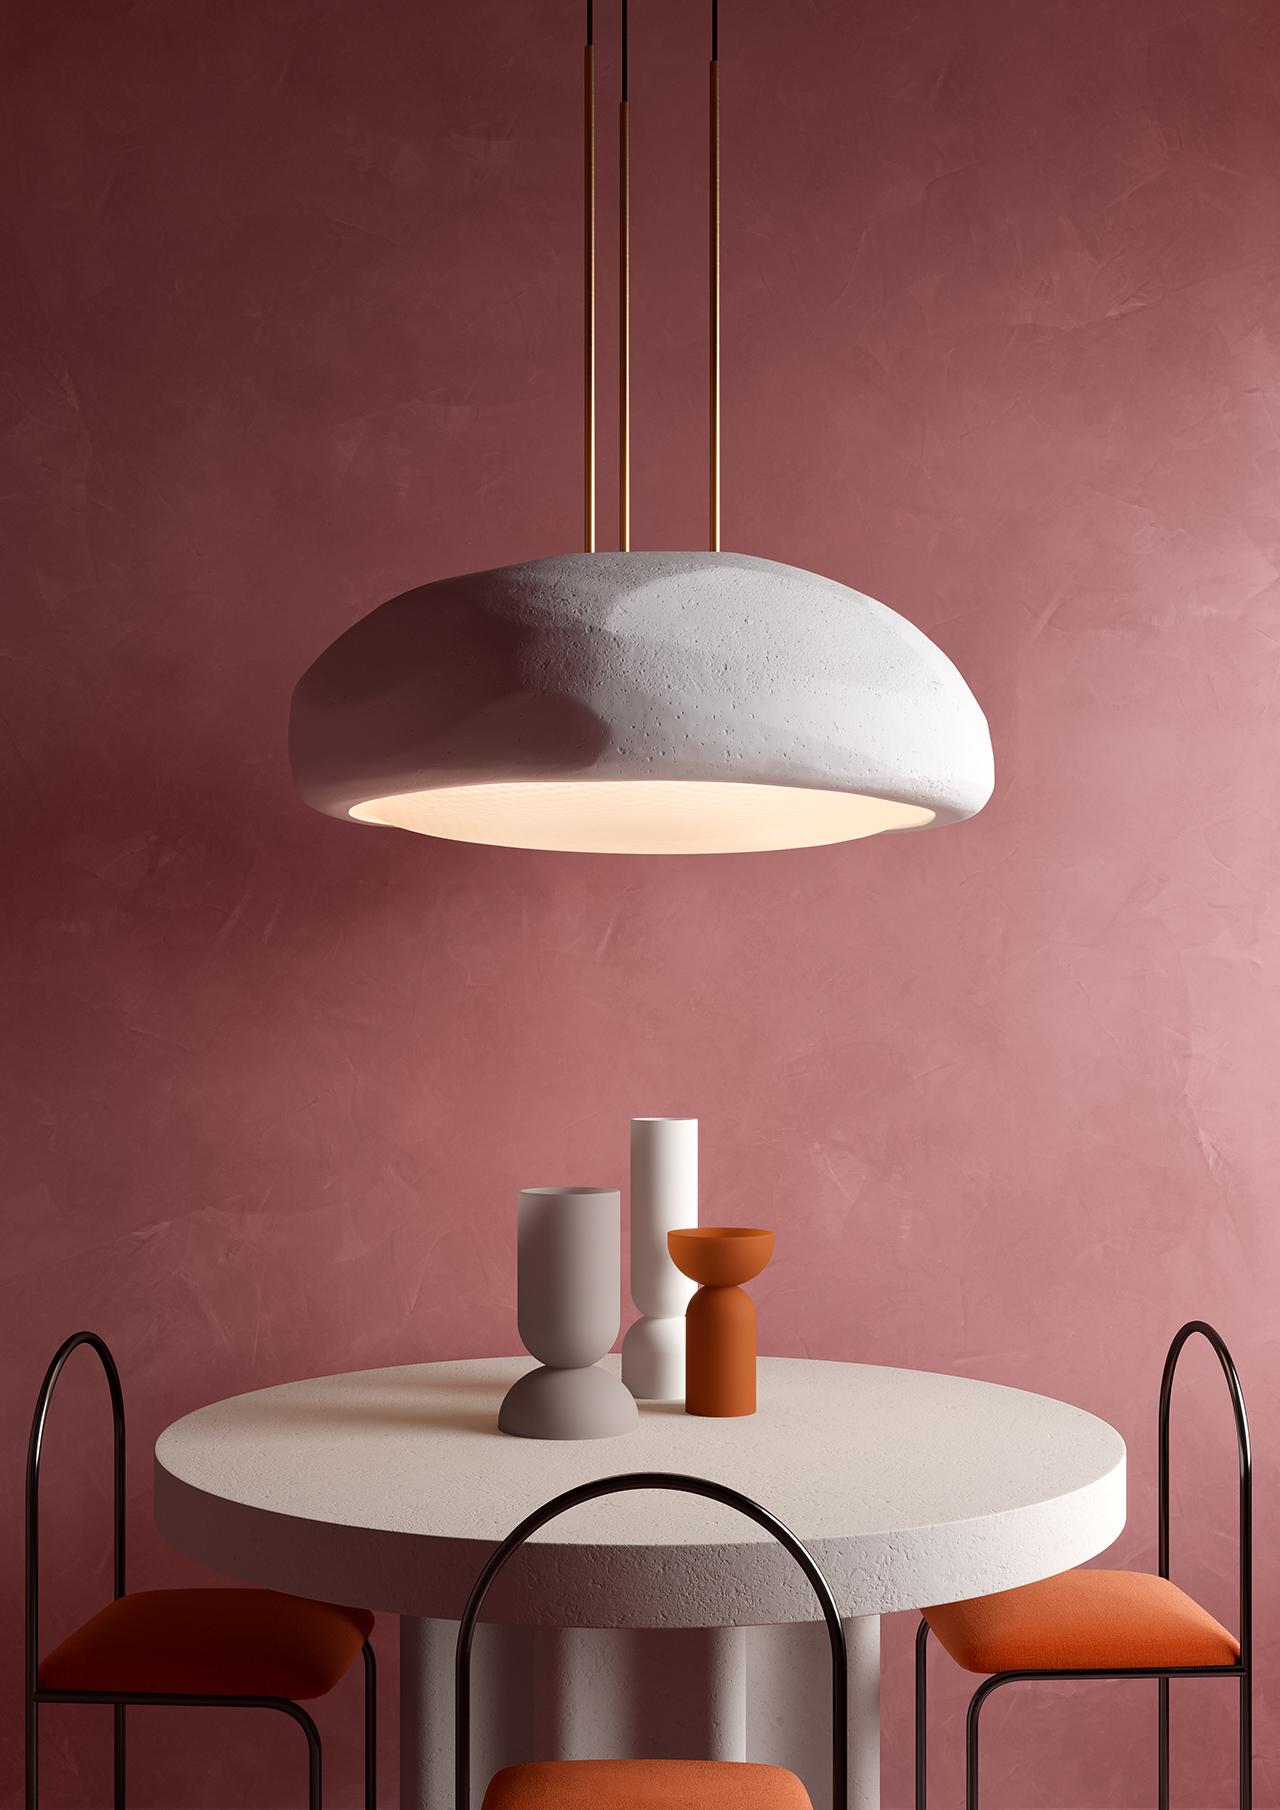 pendant lighting in living space